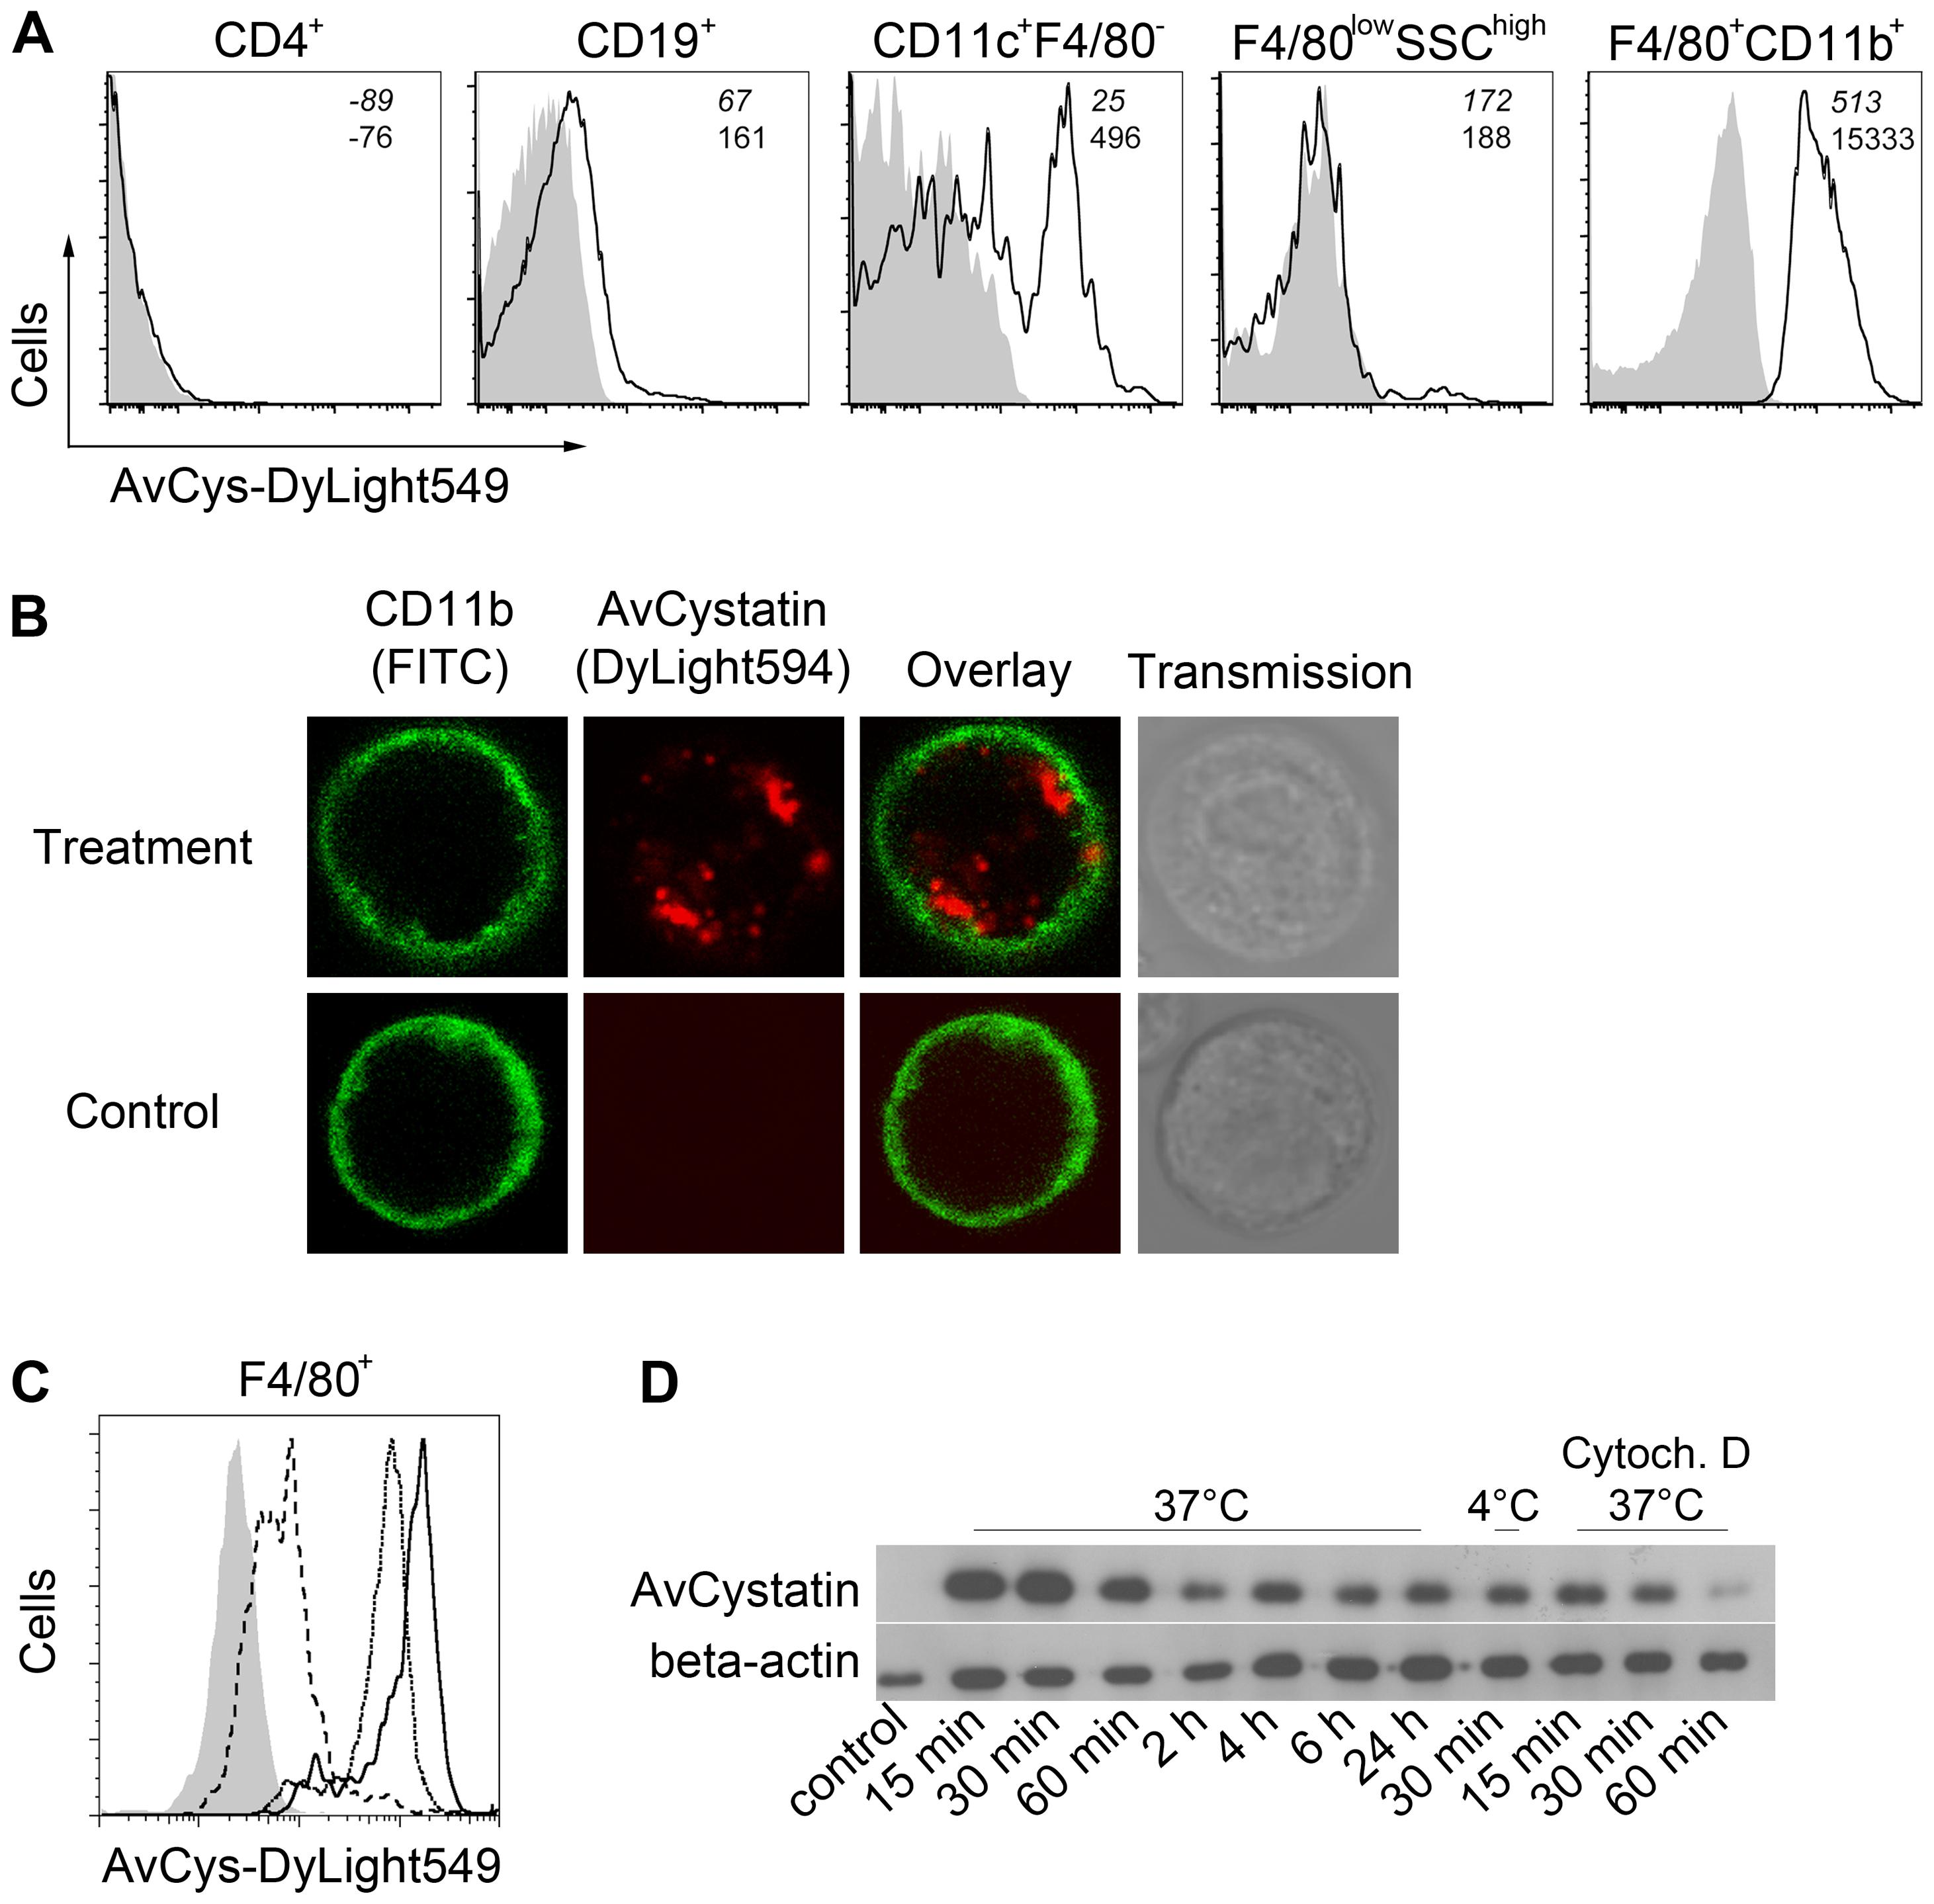 Uptake of AvCystatin by peritoneal macrophages.